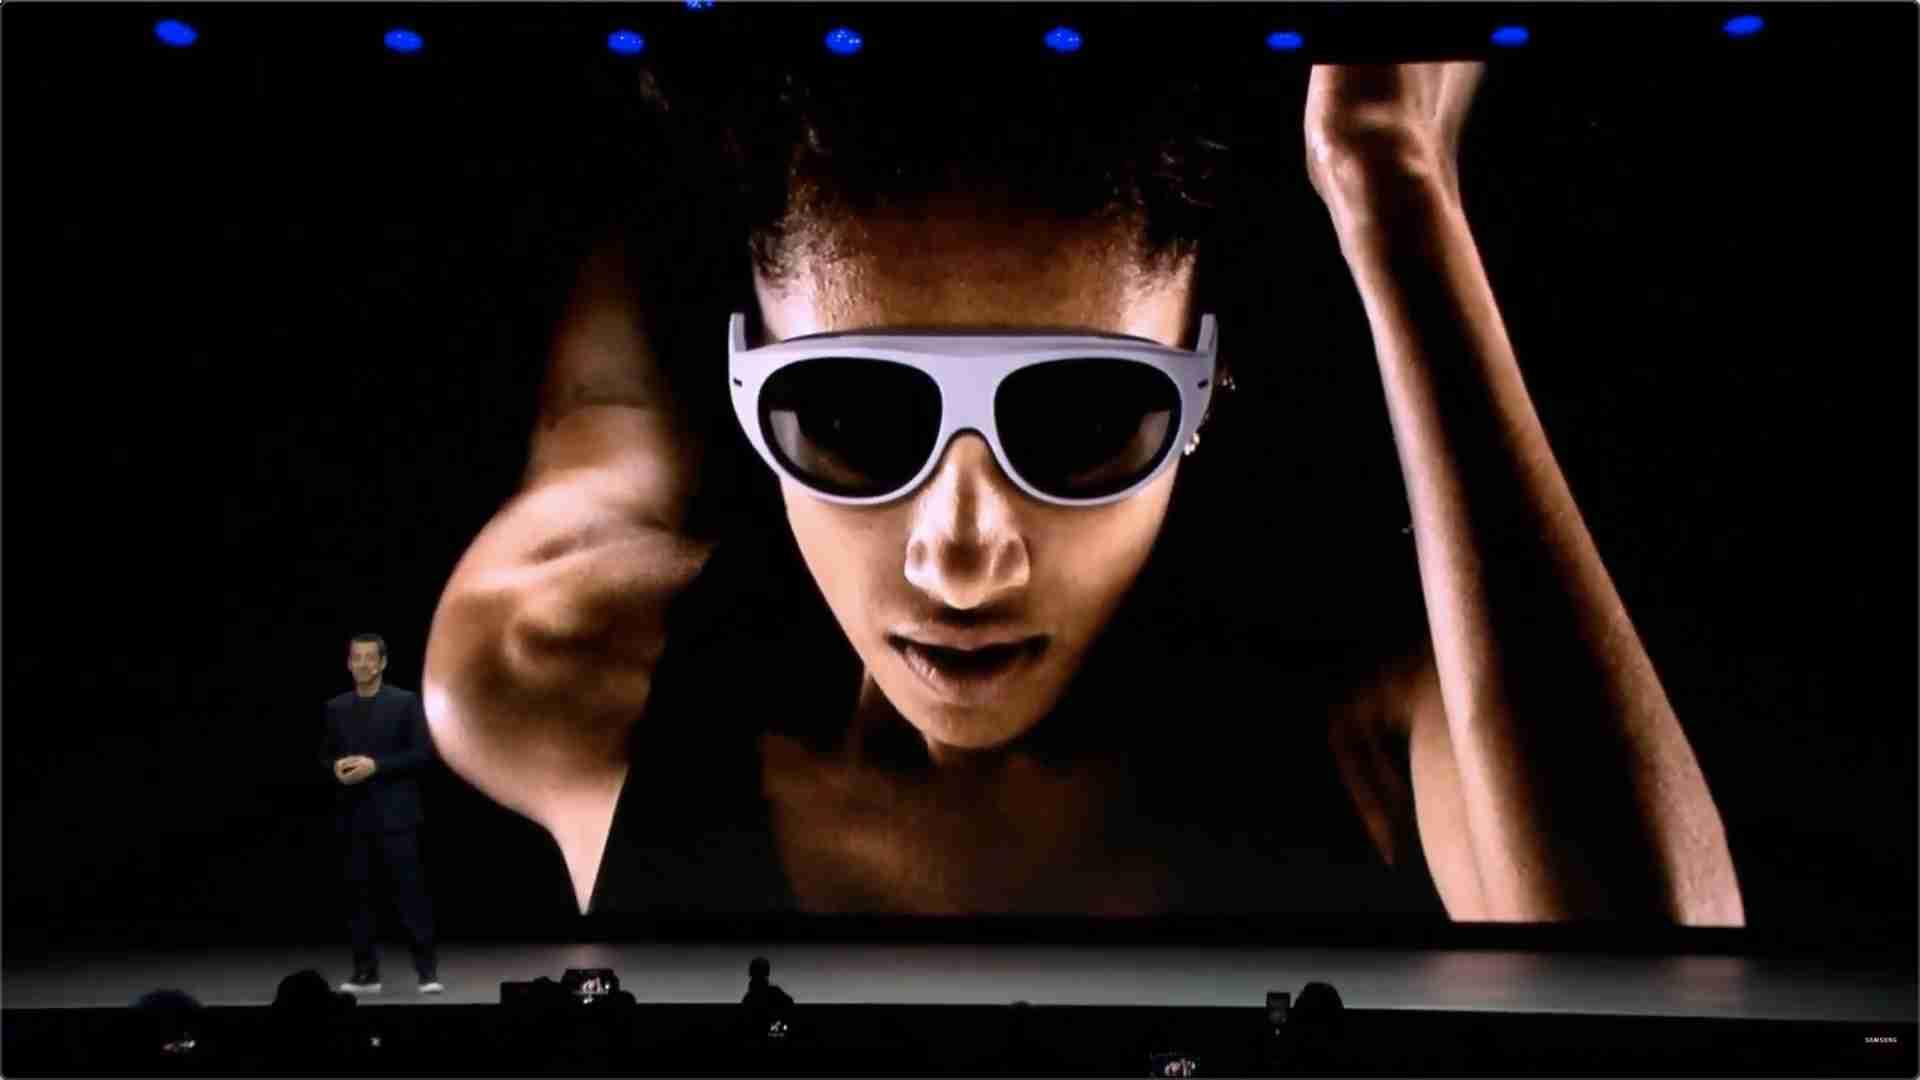 三星 CES 2020 AR 眼镜